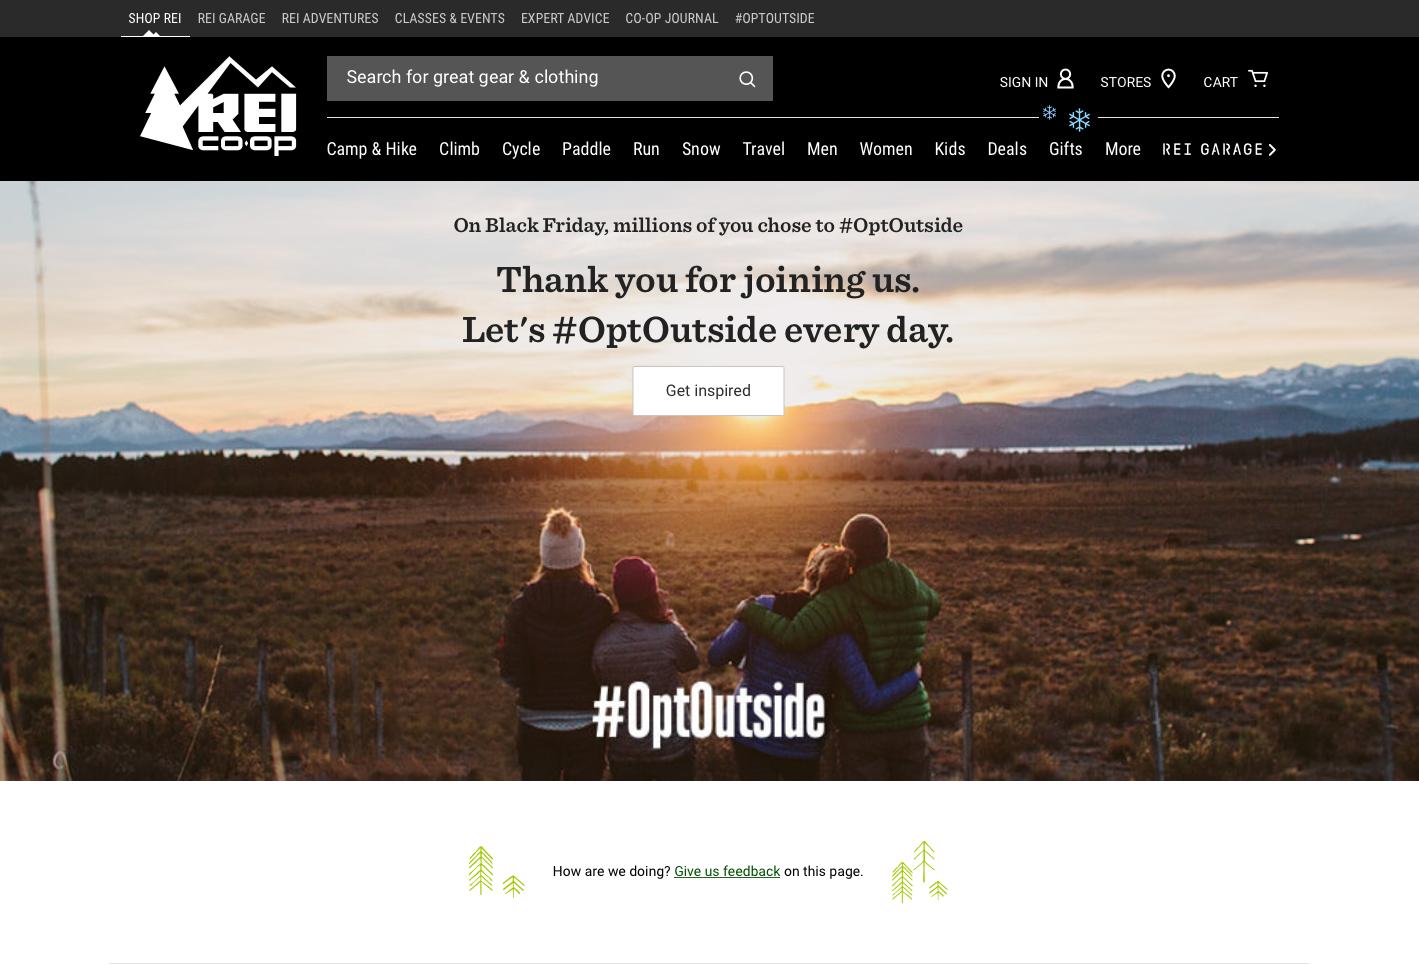 REI #OptOutside Campaign